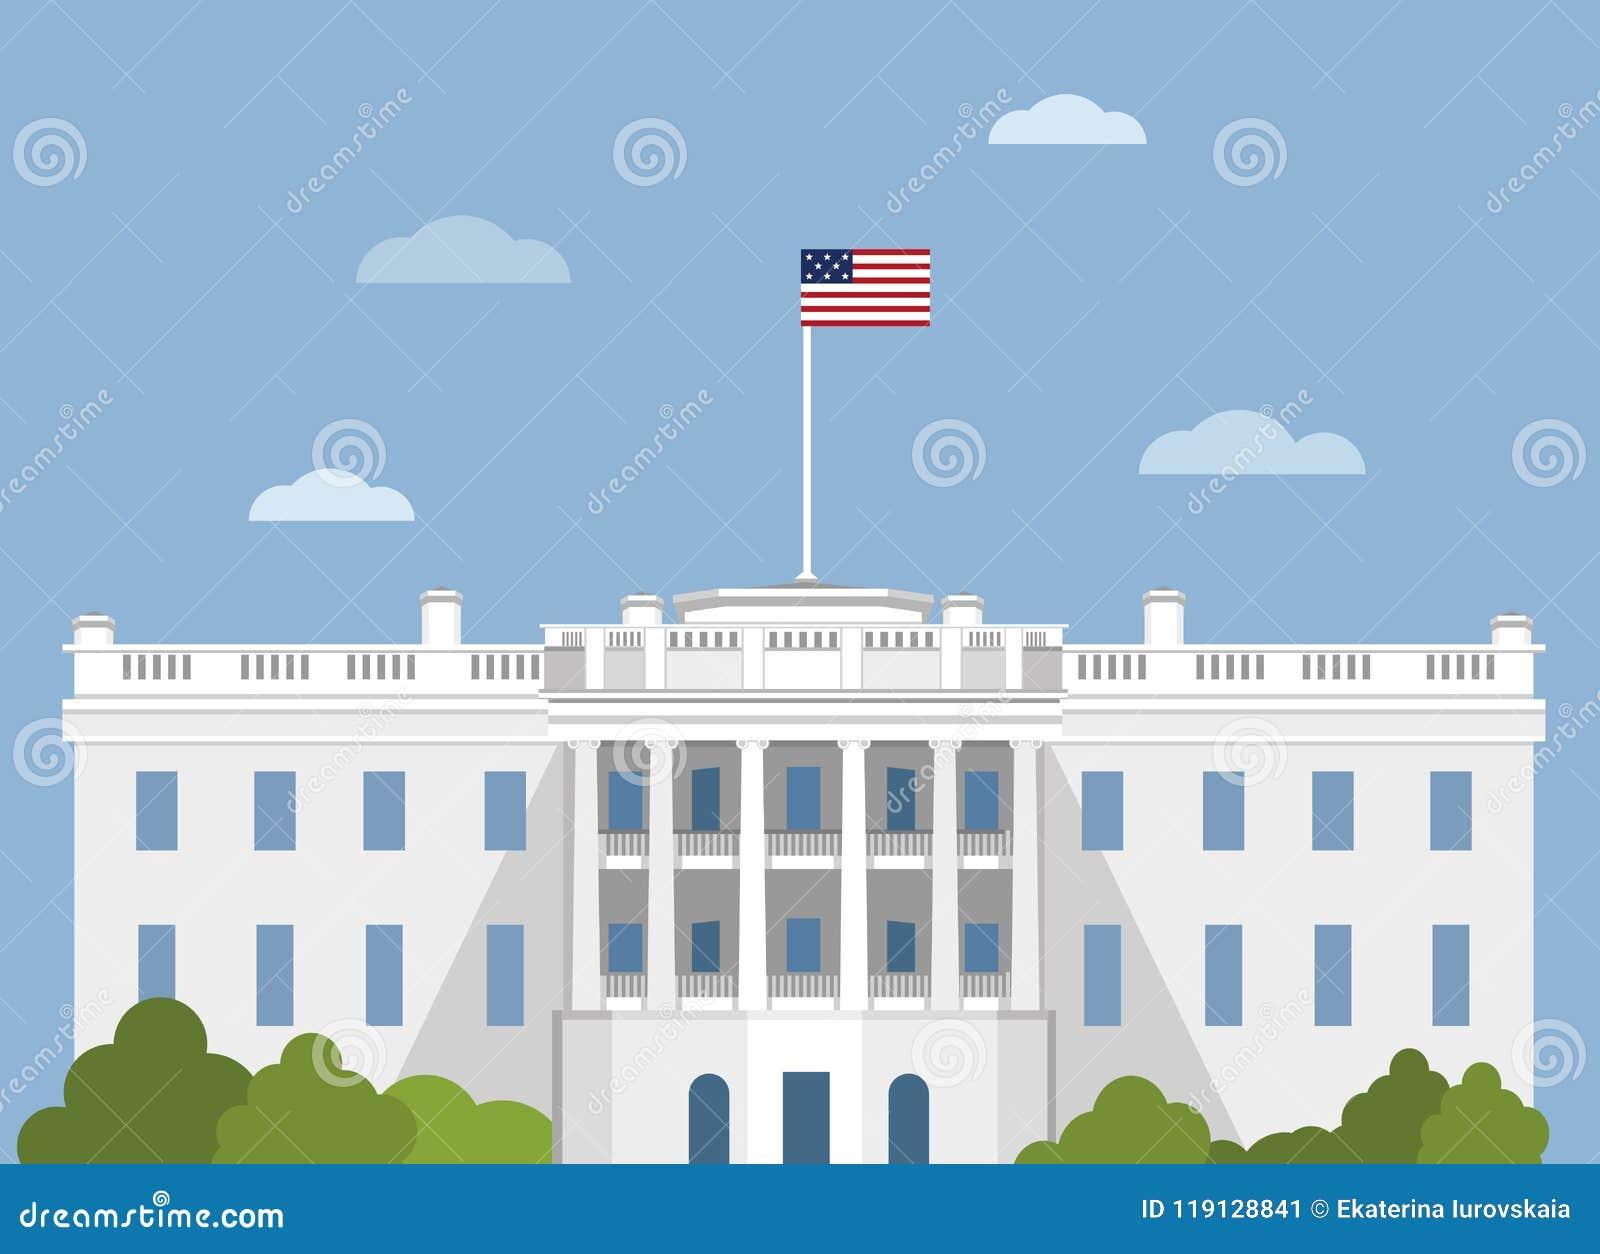 white house washington dc stock illustration illustration of rh dreamstime com